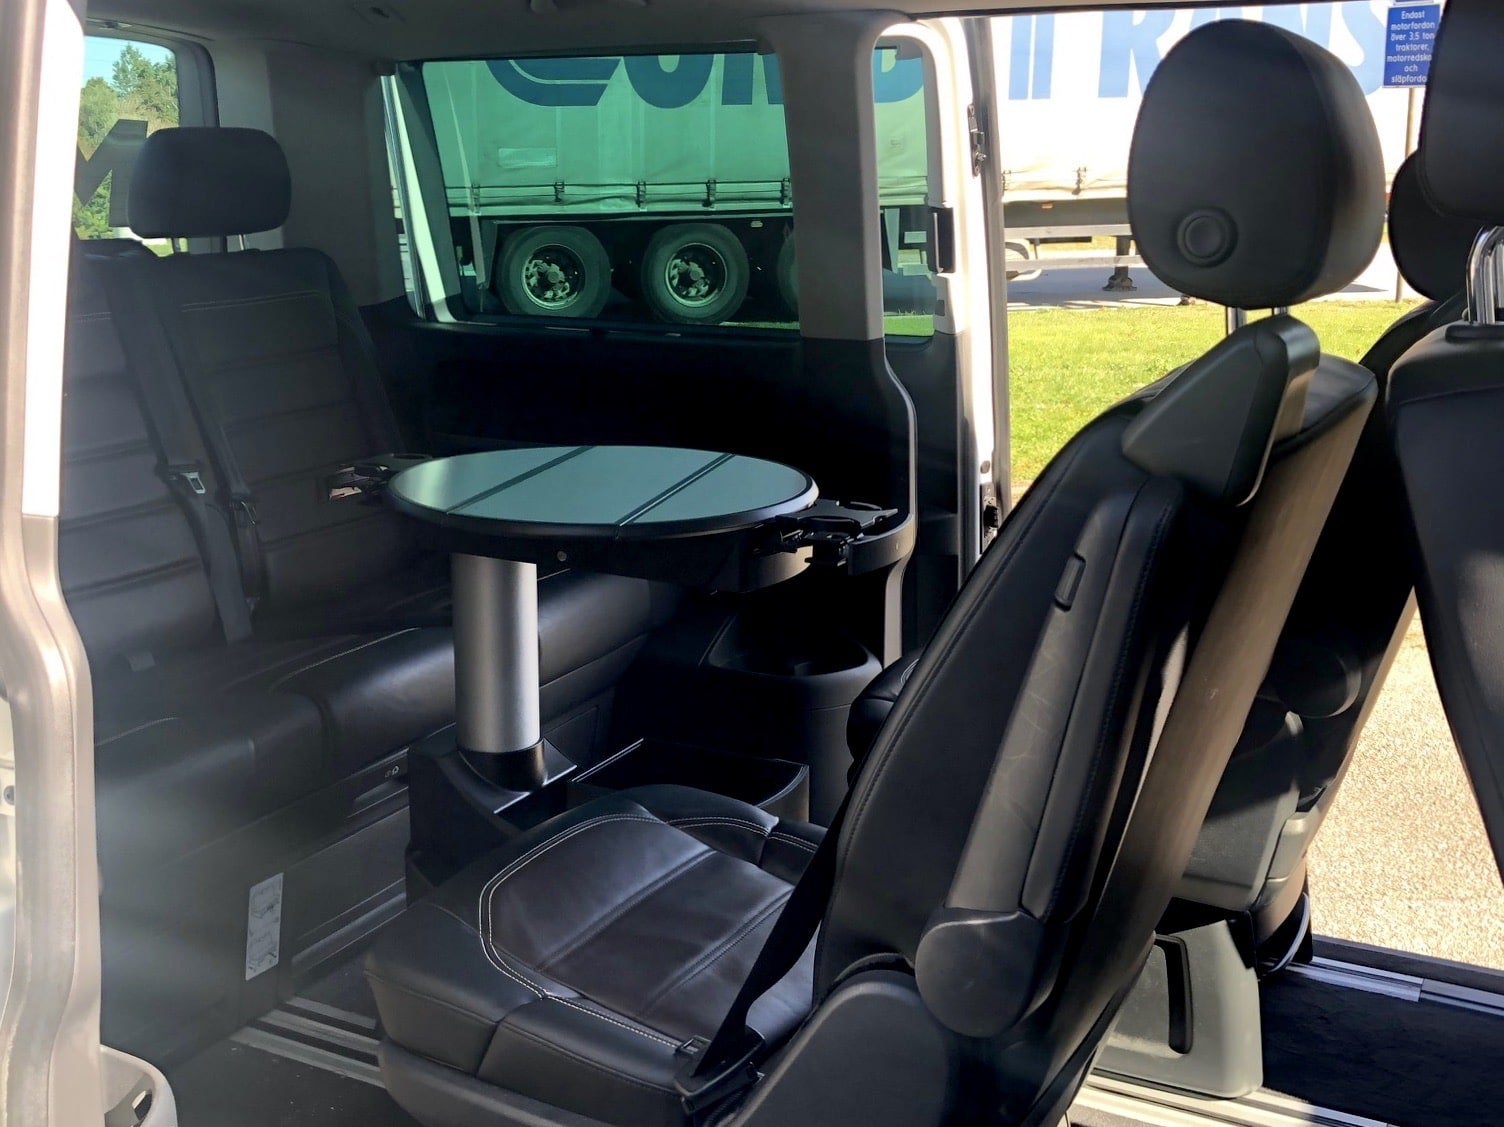 VW-Multivan2.0TDI-comfort-lyx